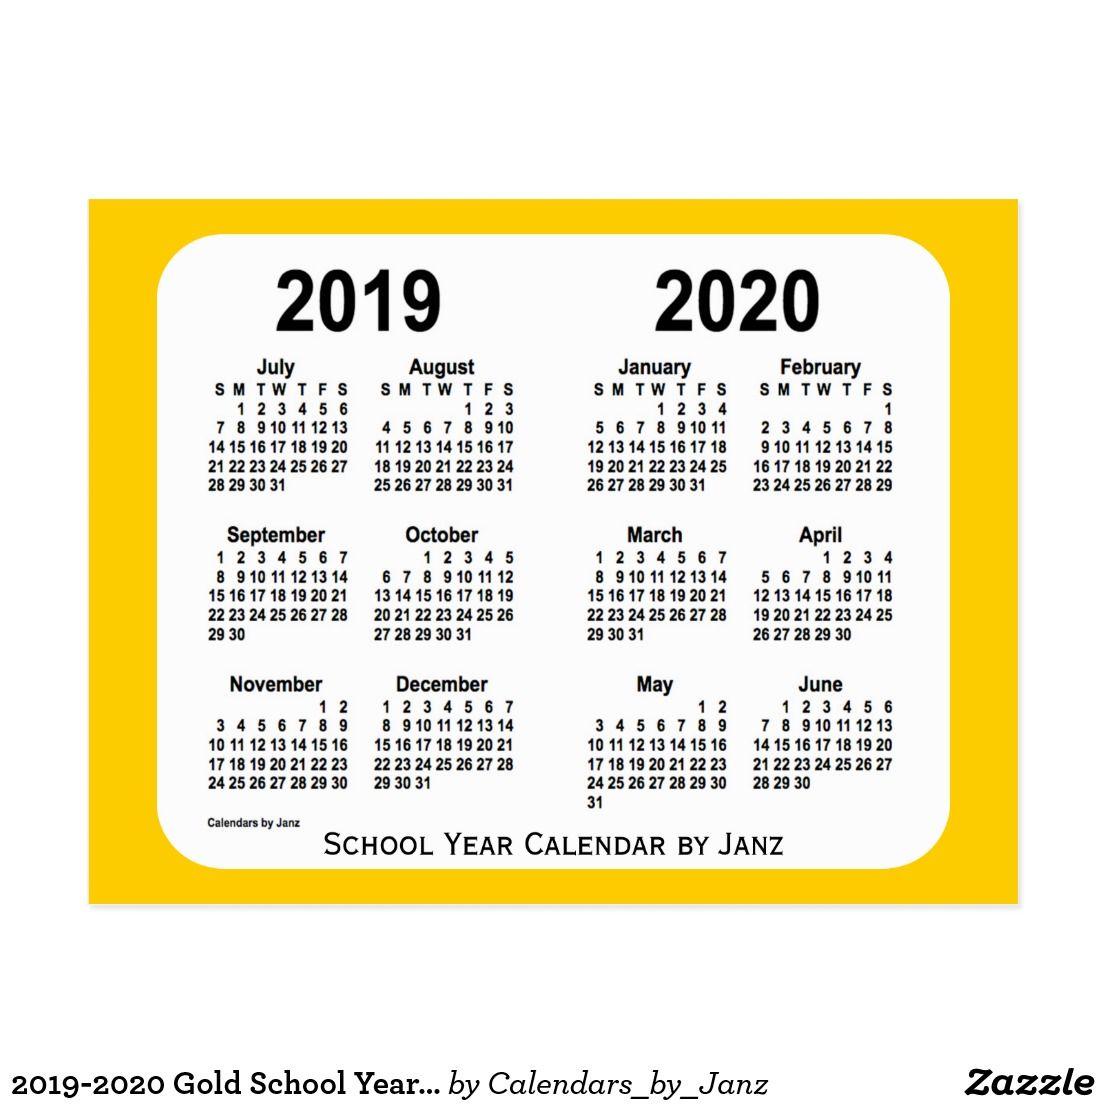 2019 2020 Gold School Year Calendar By Janz Postcard Zazzle Com